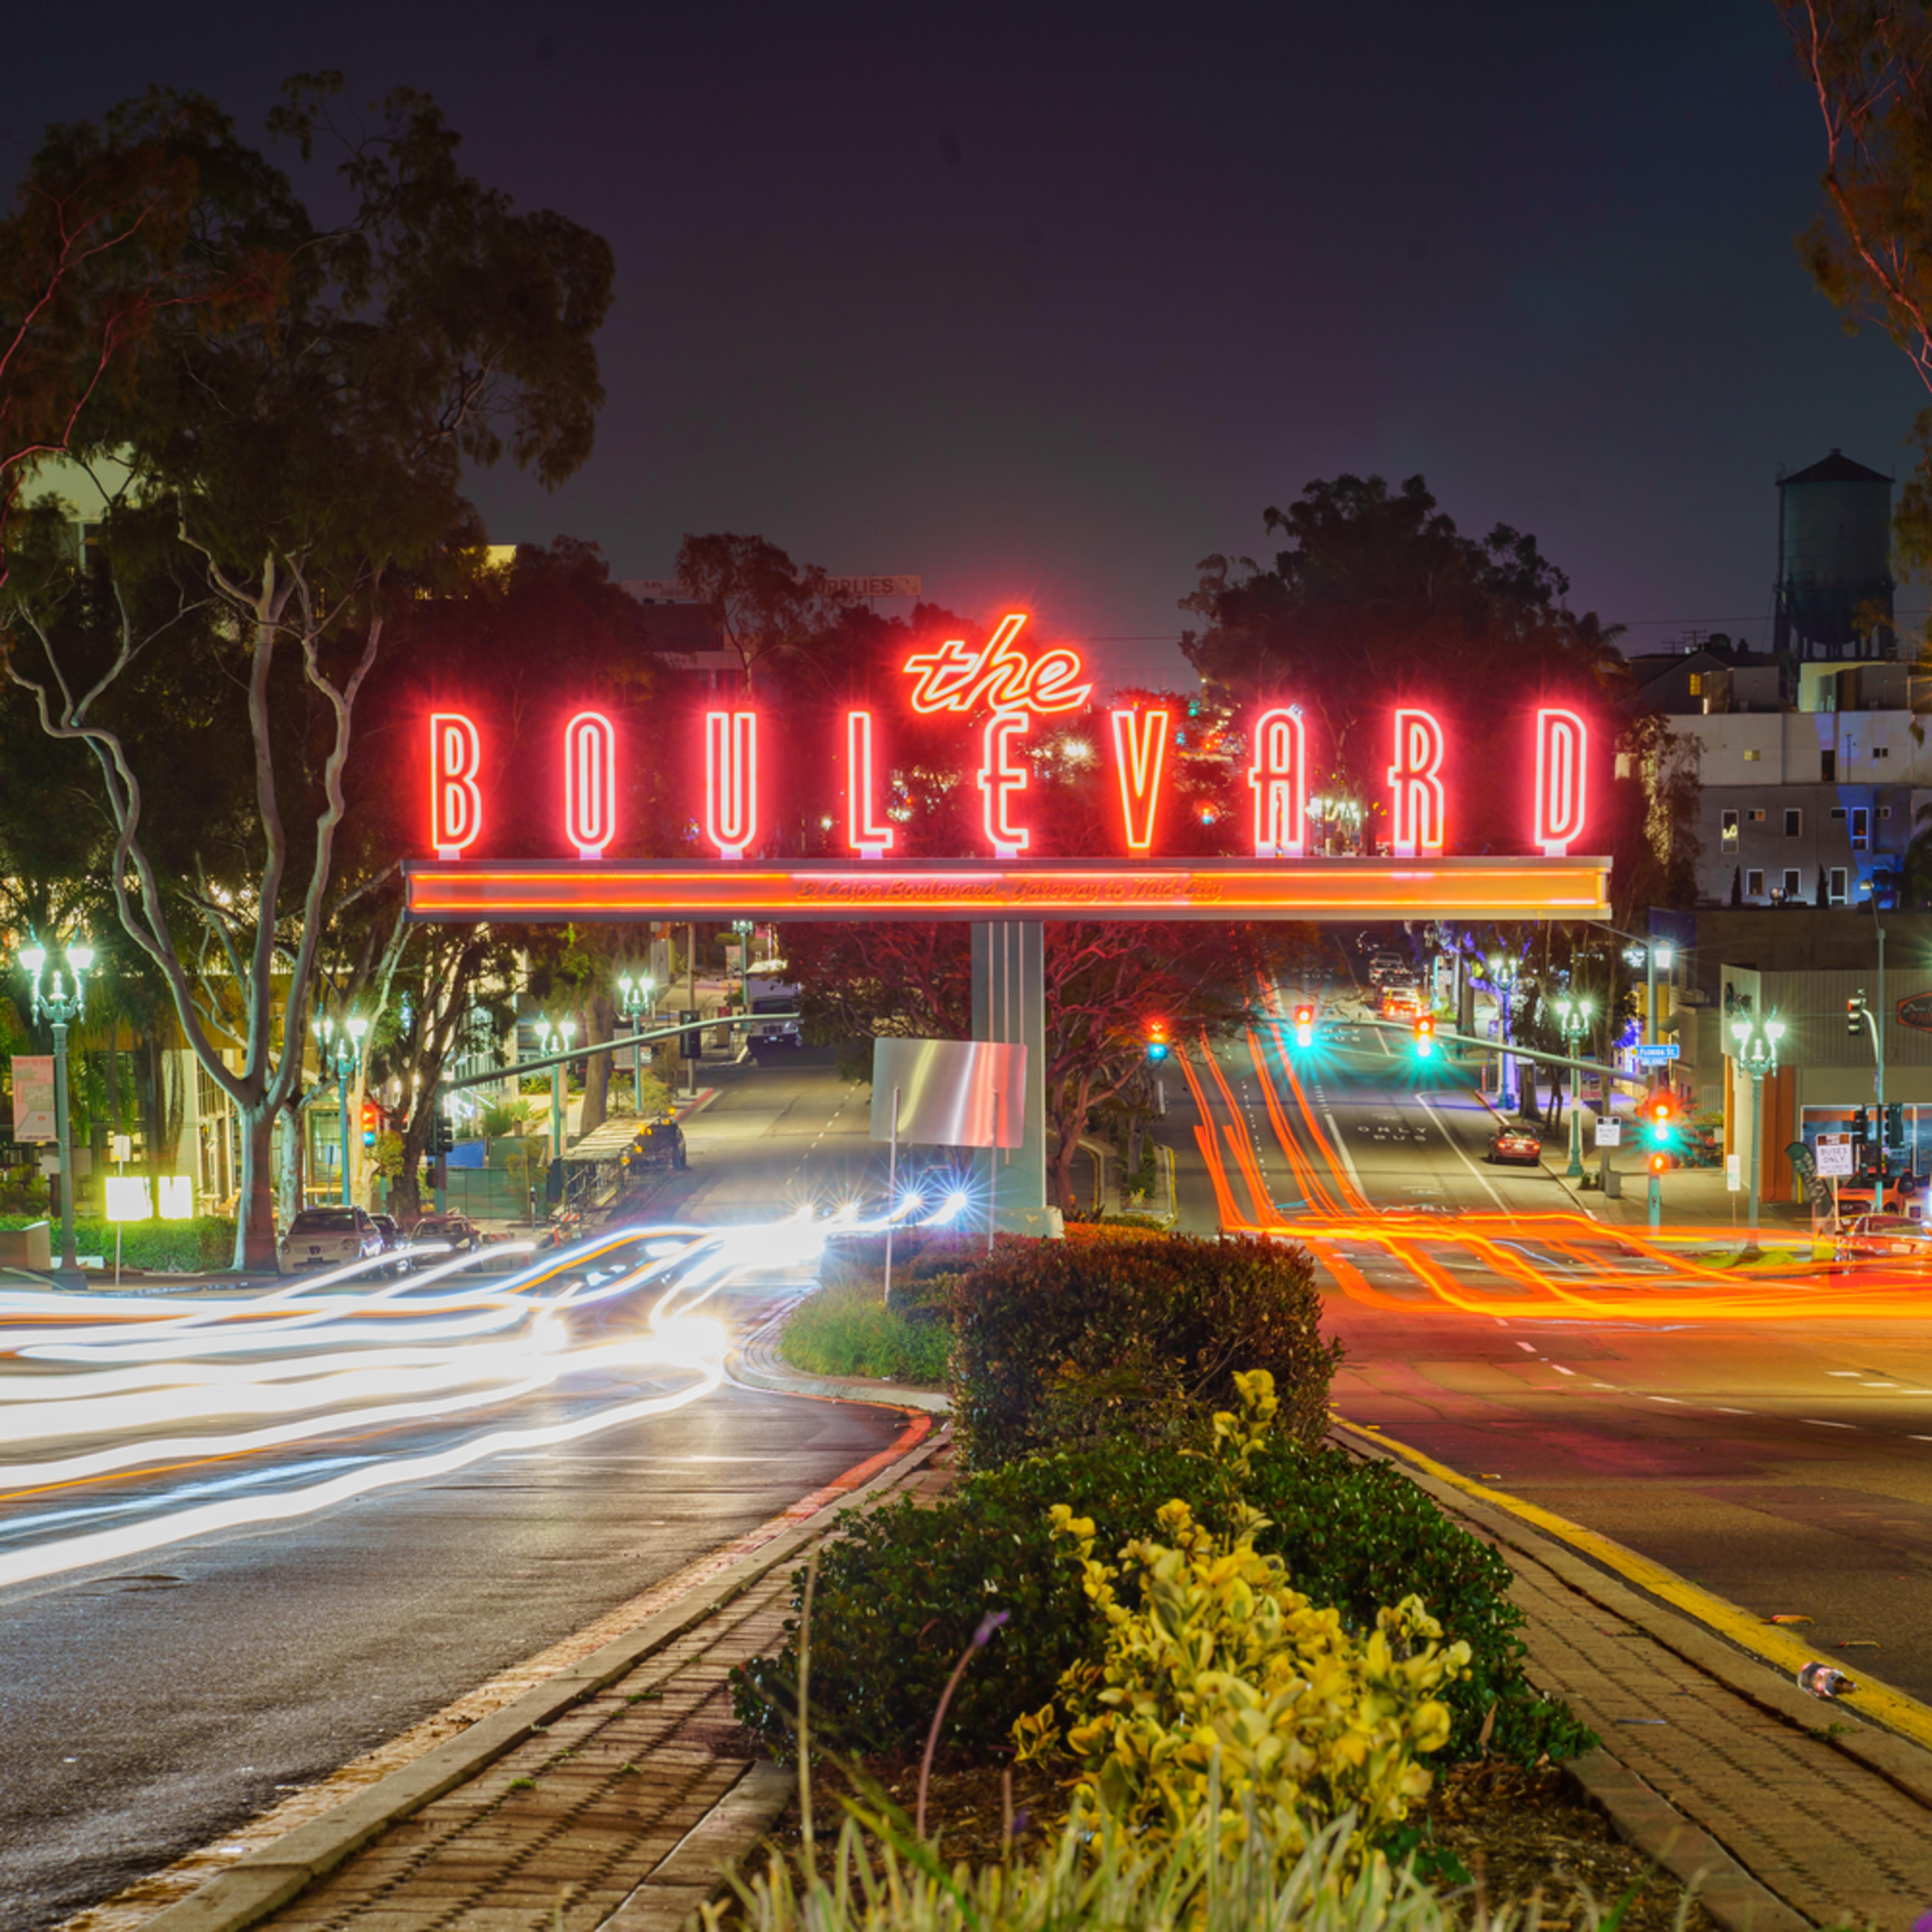 Boulevard fitness sign with light streaks 3 29 2020 1 of 1 lg9foe